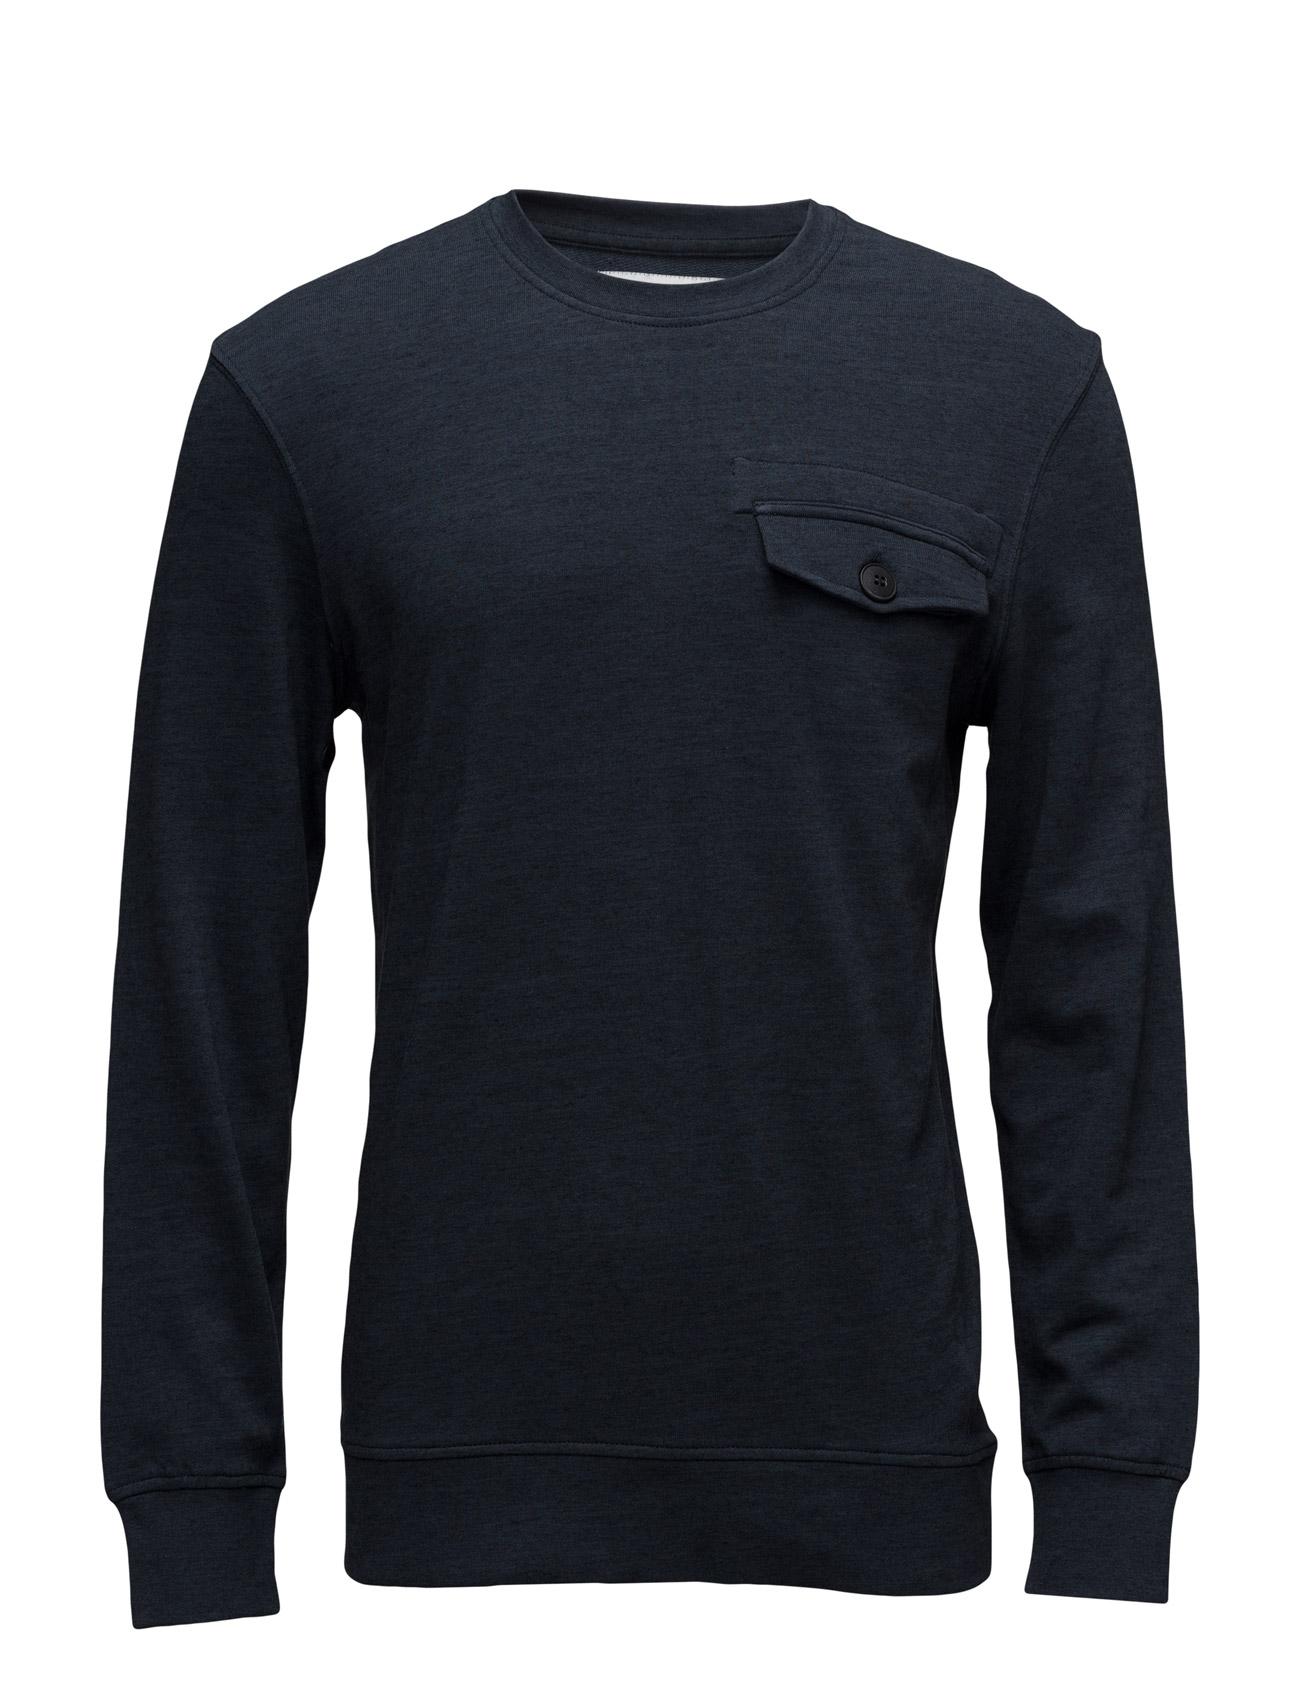 Jcoc90 Sweat Crew Neck Jack & Jones Core Sweat pants til Mænd i Navy Blazer